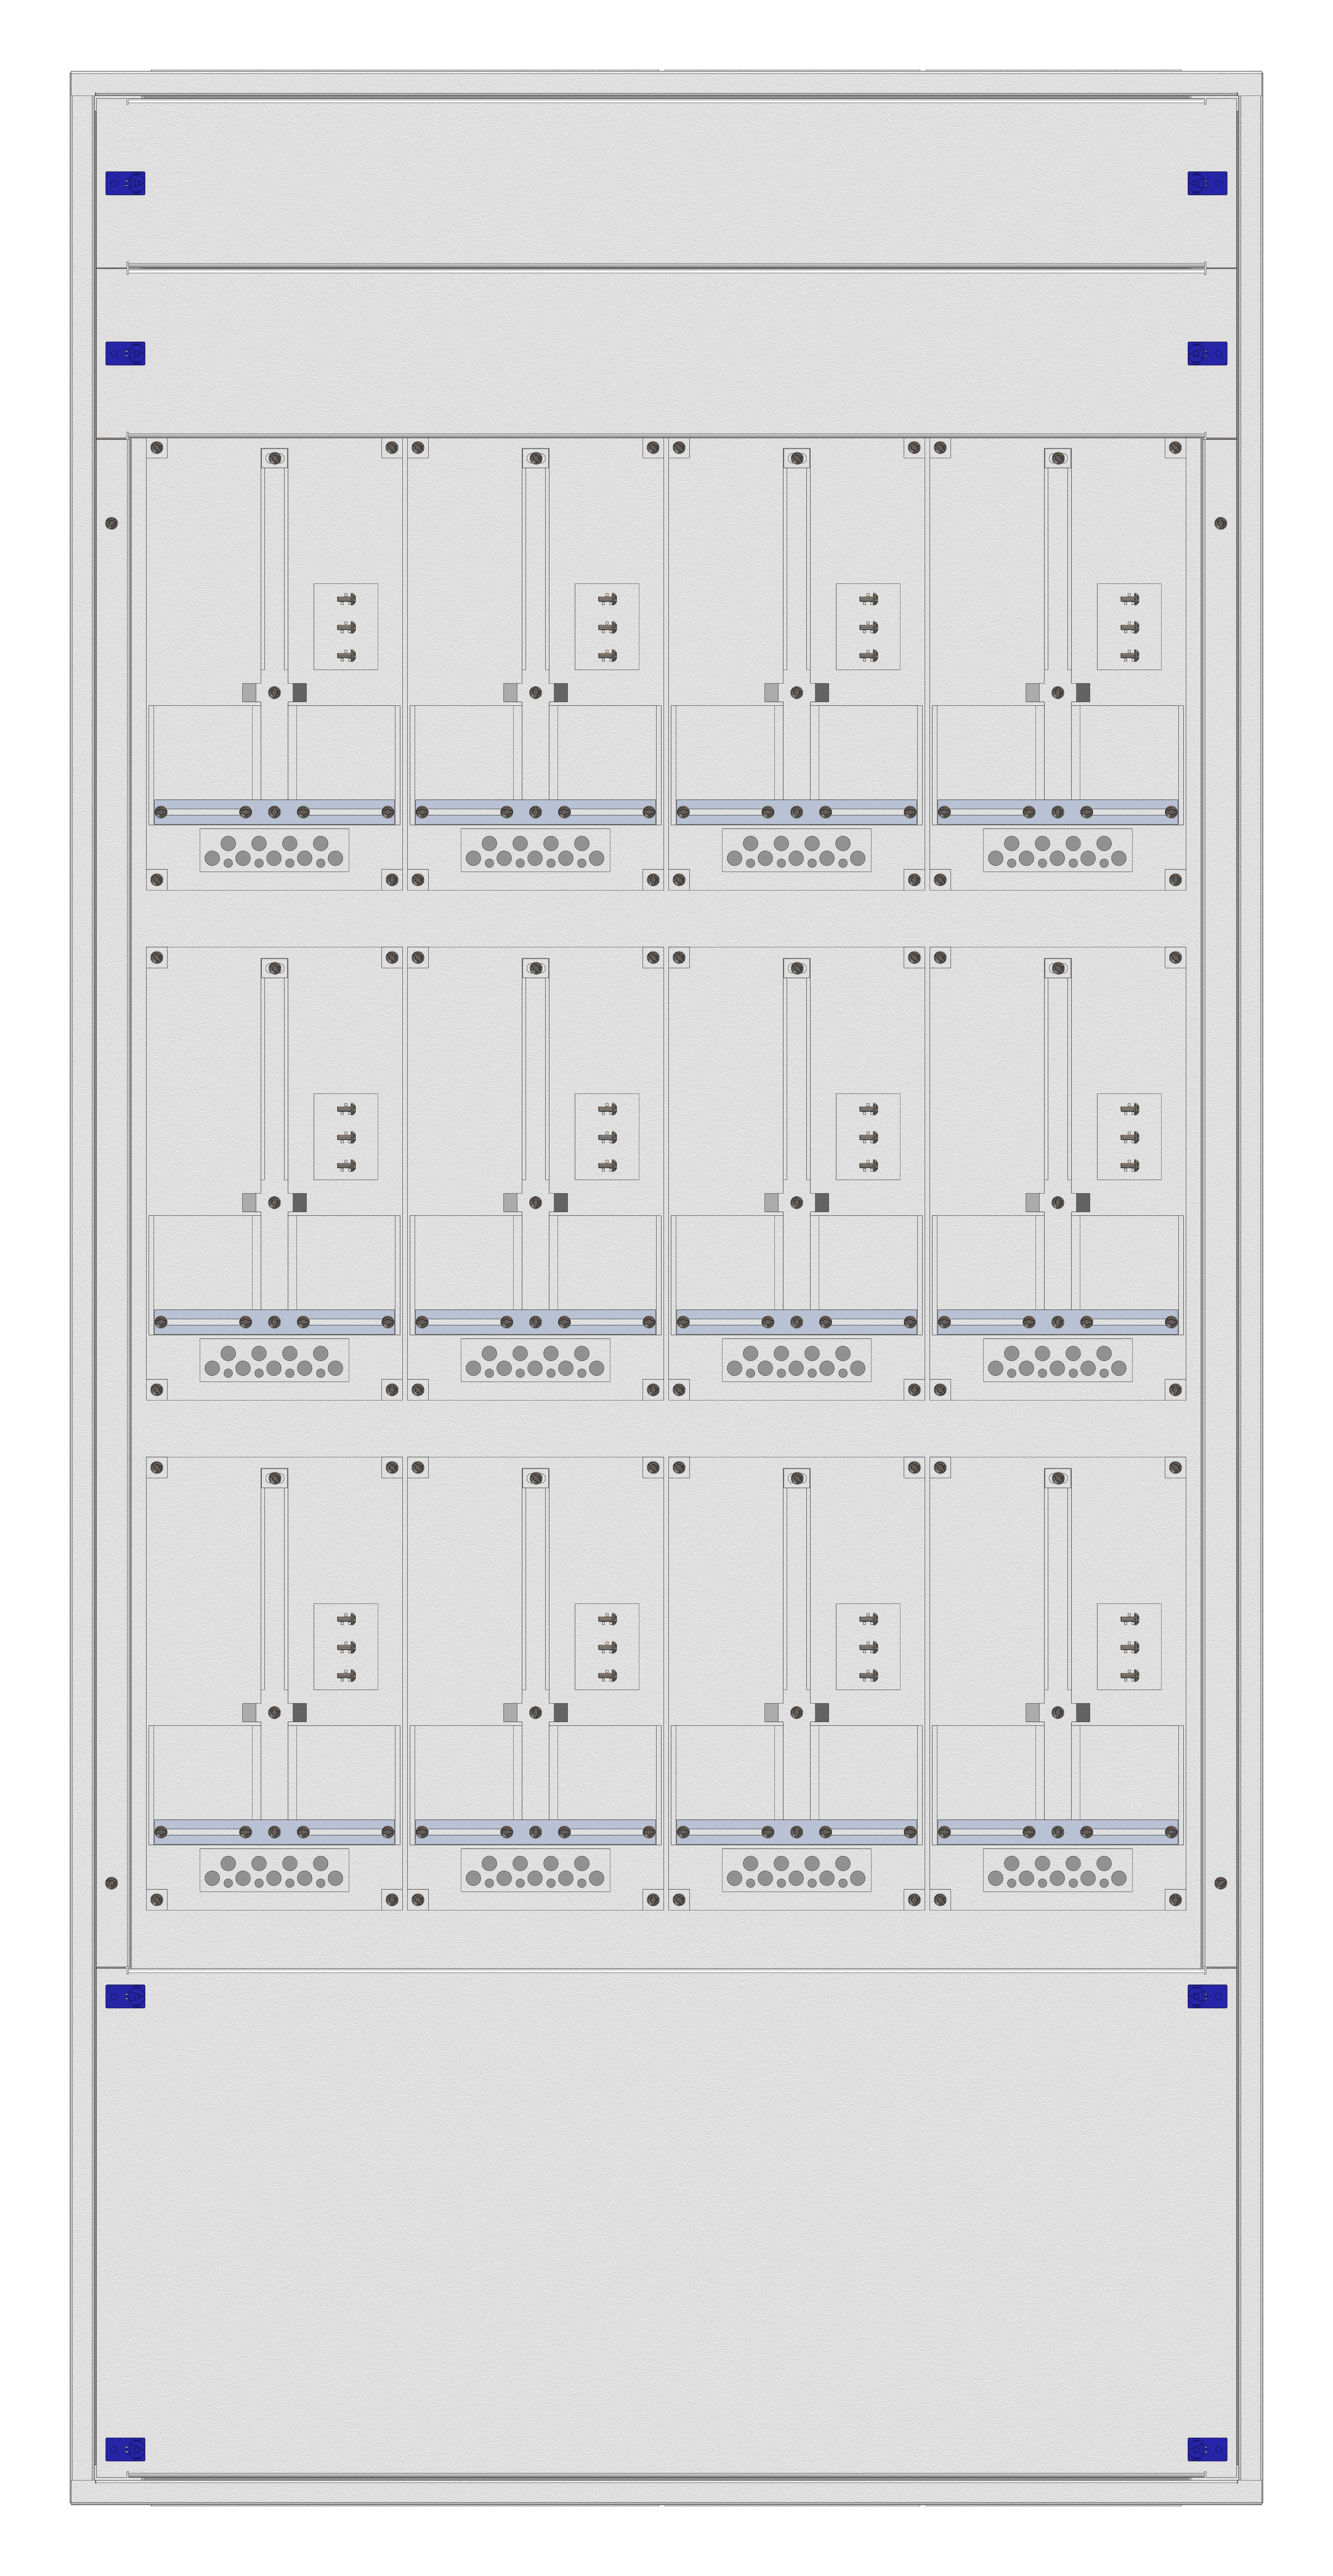 1 Stk Masken-Zählerverteiler 4M-42O/KTN 12ZP, H1995B980T200mm IL122442KK